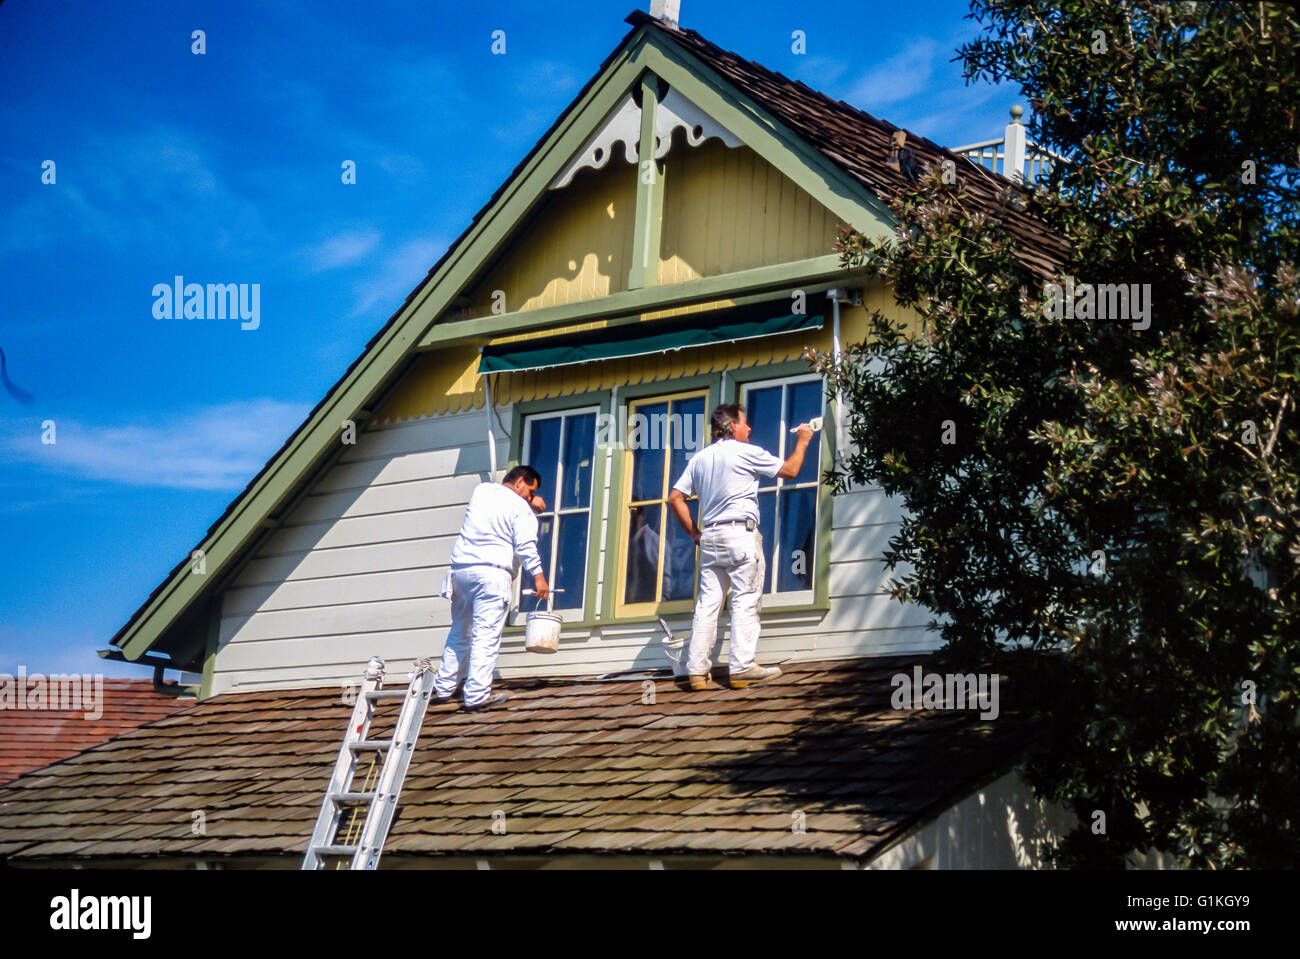 Hispanic men painting historic house in Long Beach, CA Myrleen Pearson - Stock Image